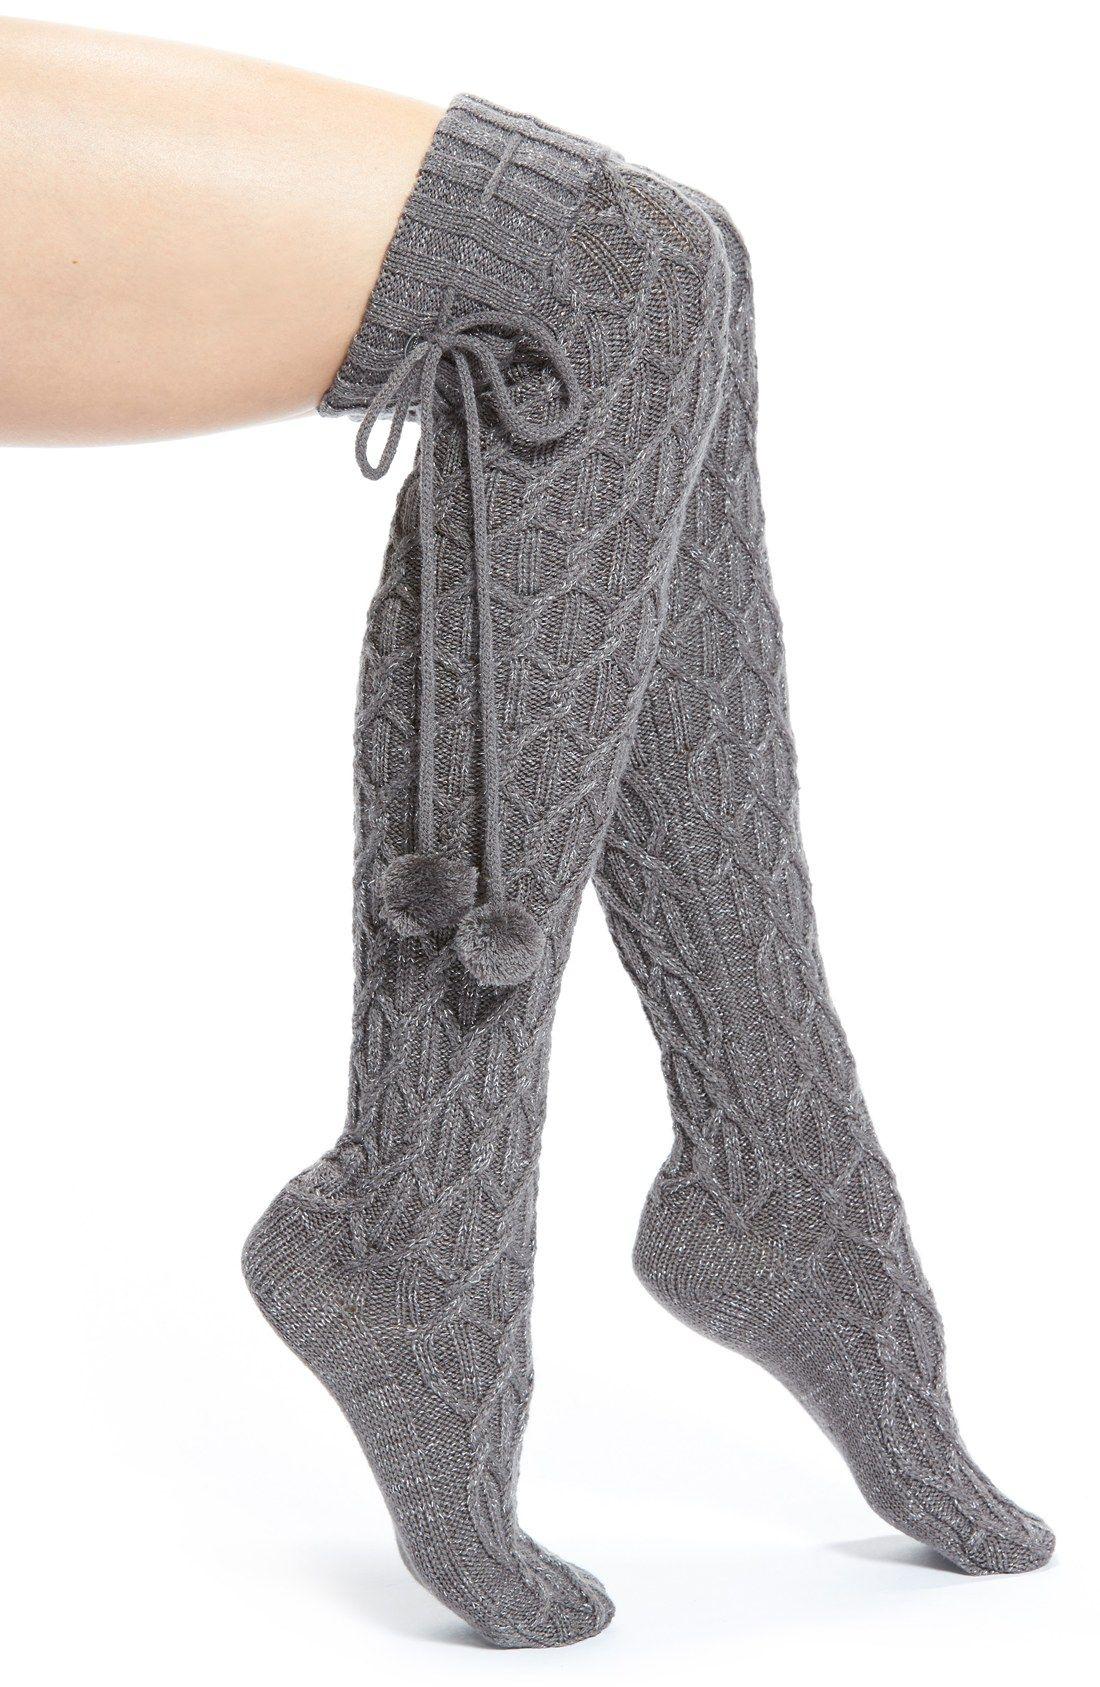 Ugg 174 Pompom Cable Knit Over The Knee Socks Fashion